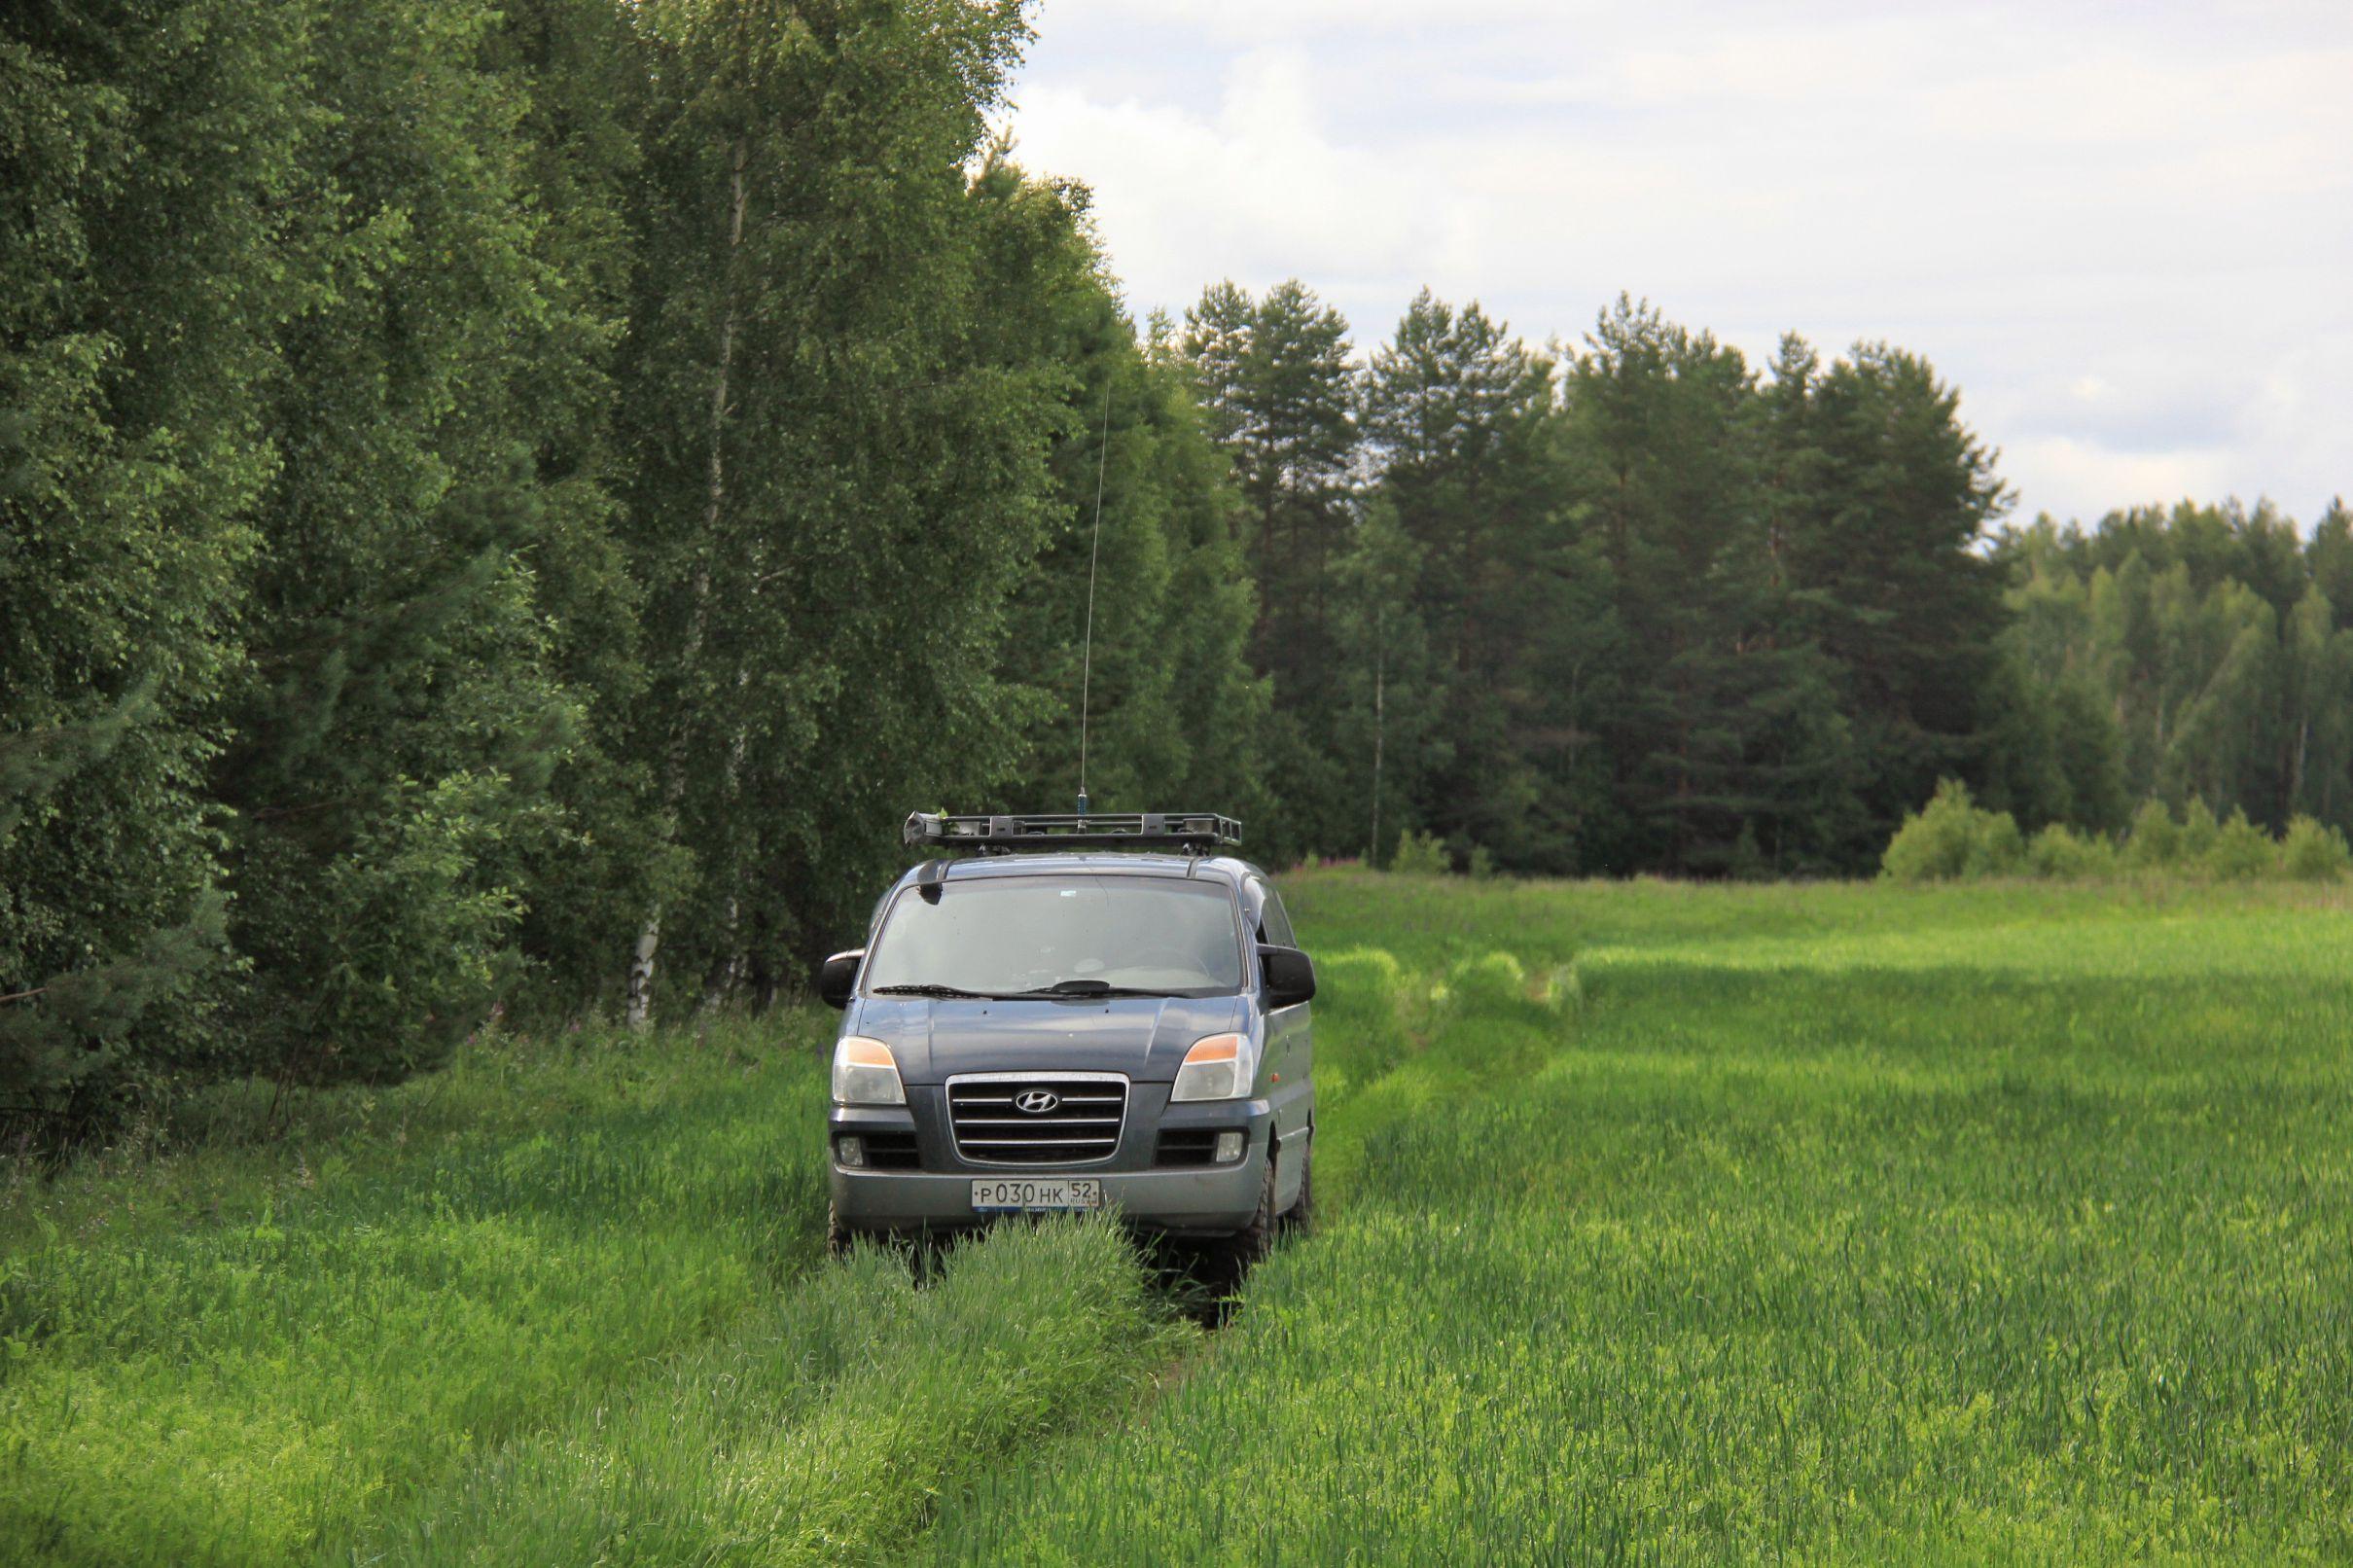 hyundai-h1-4WD